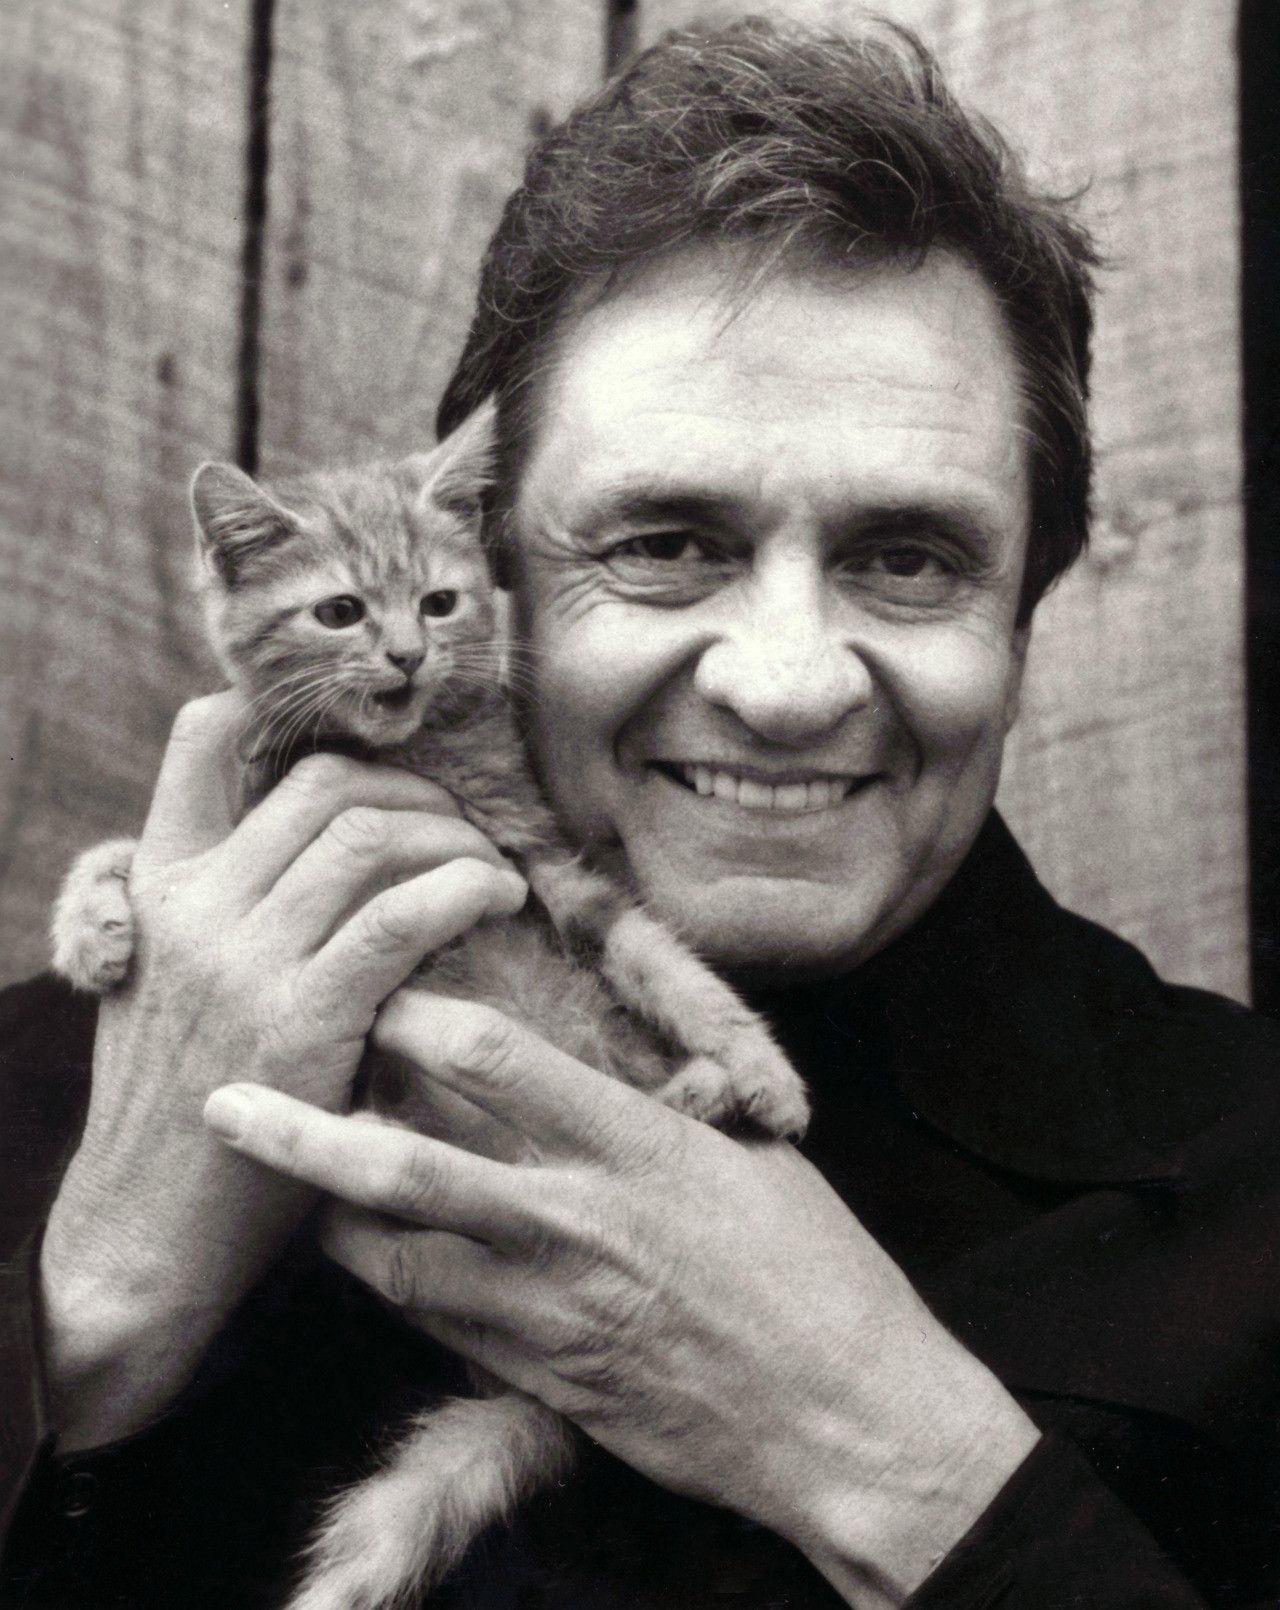 Cash and kitten